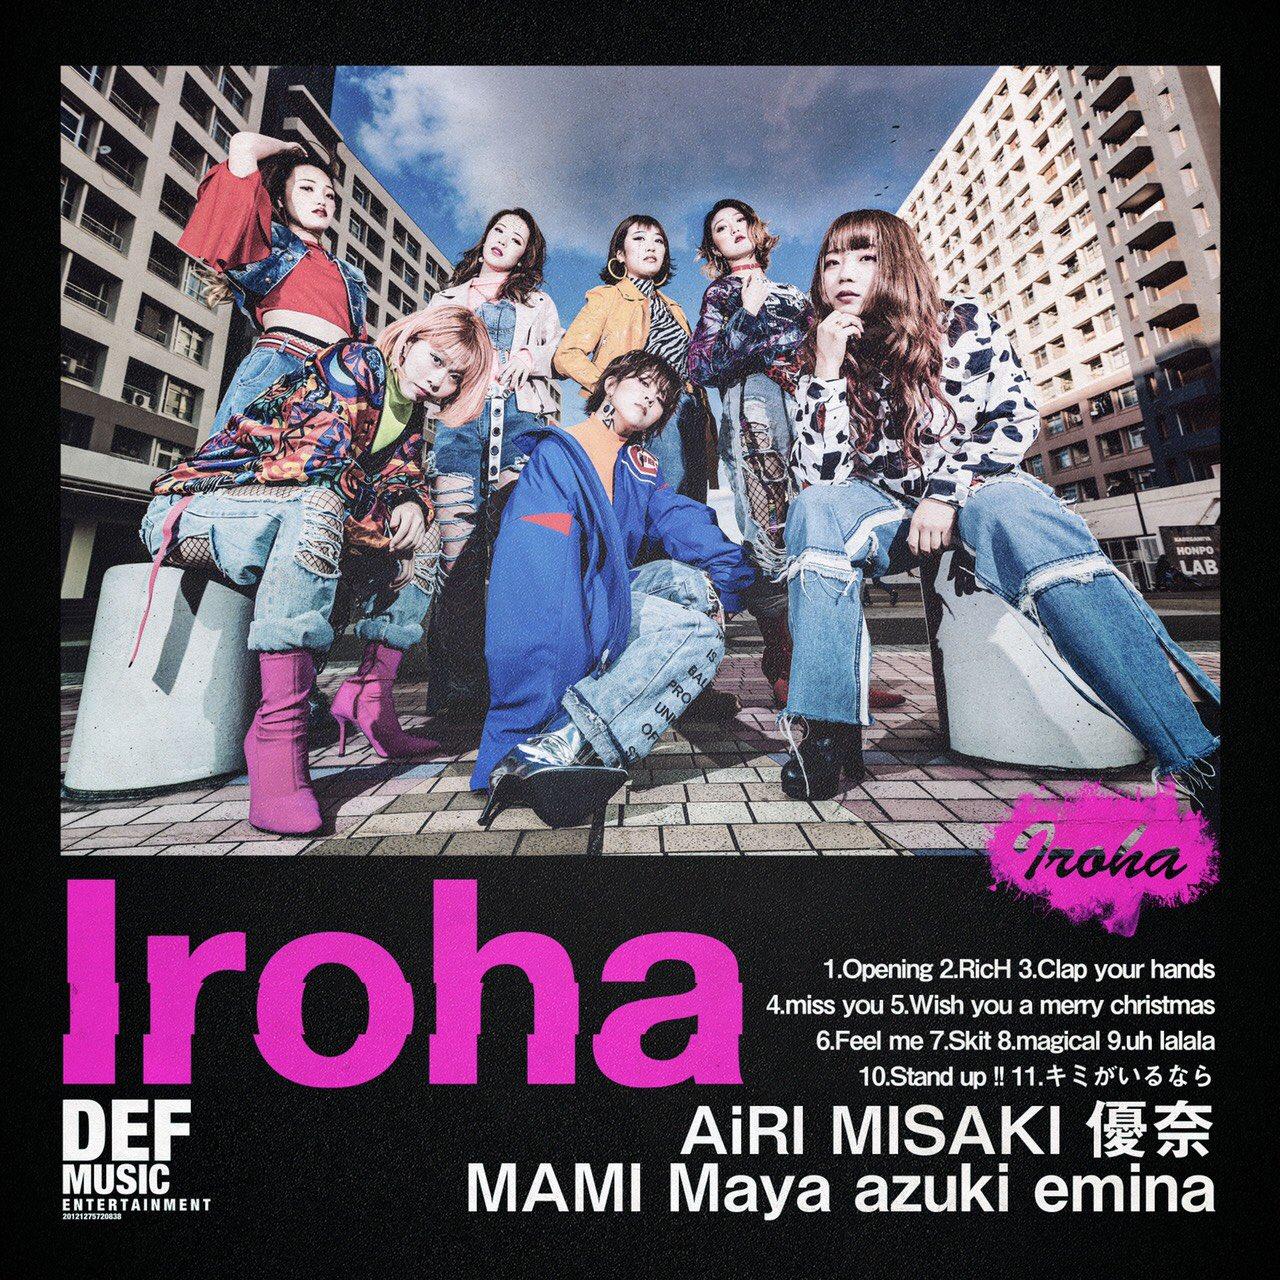 Iroha (Album)